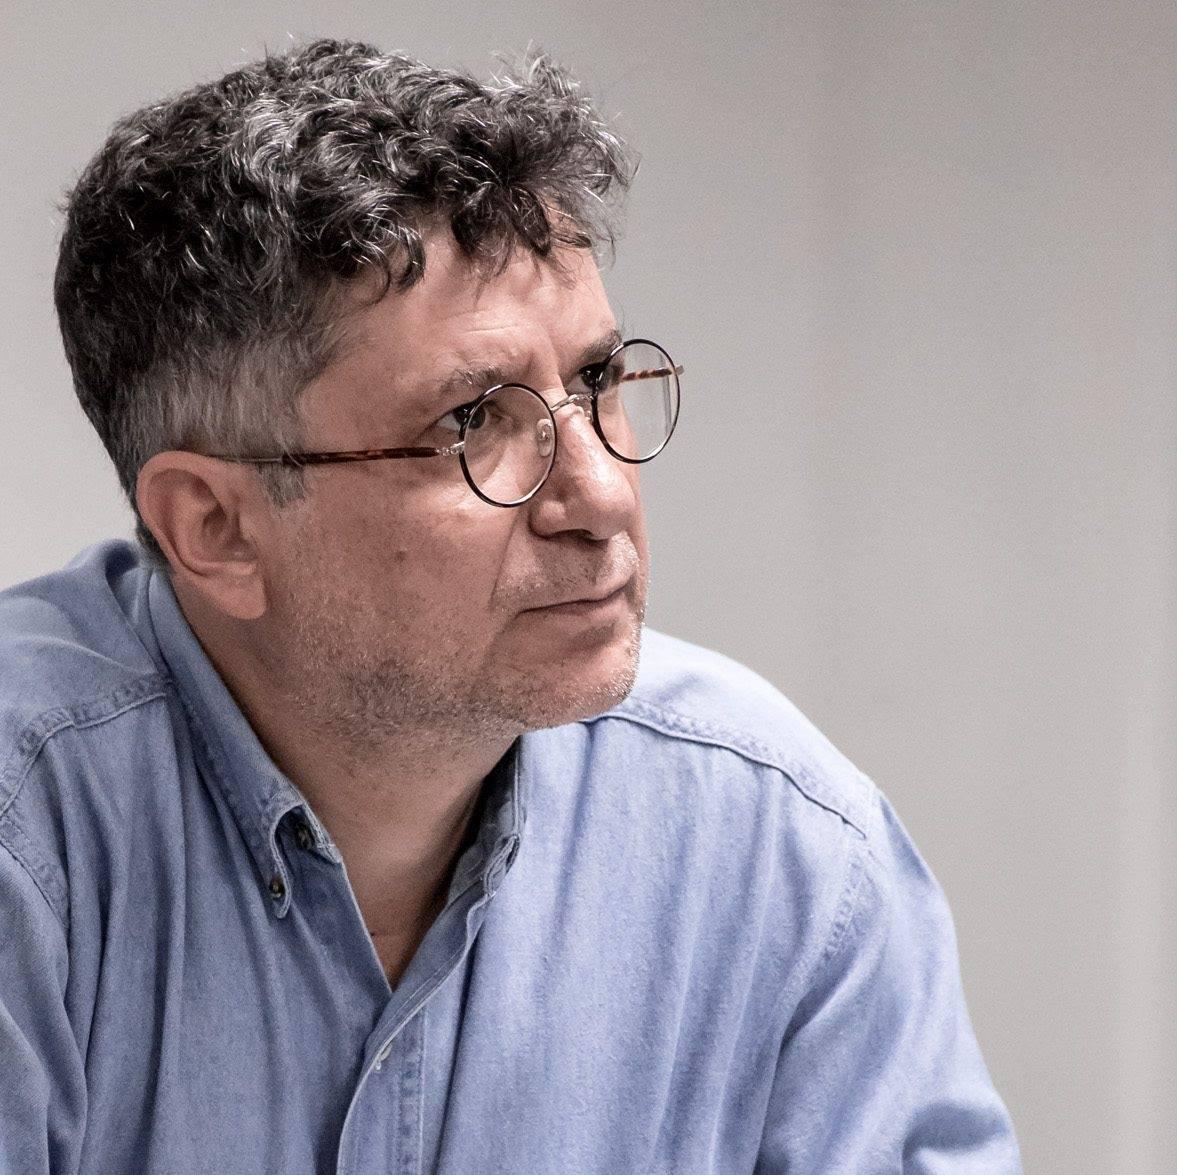 Jaime Chabaud